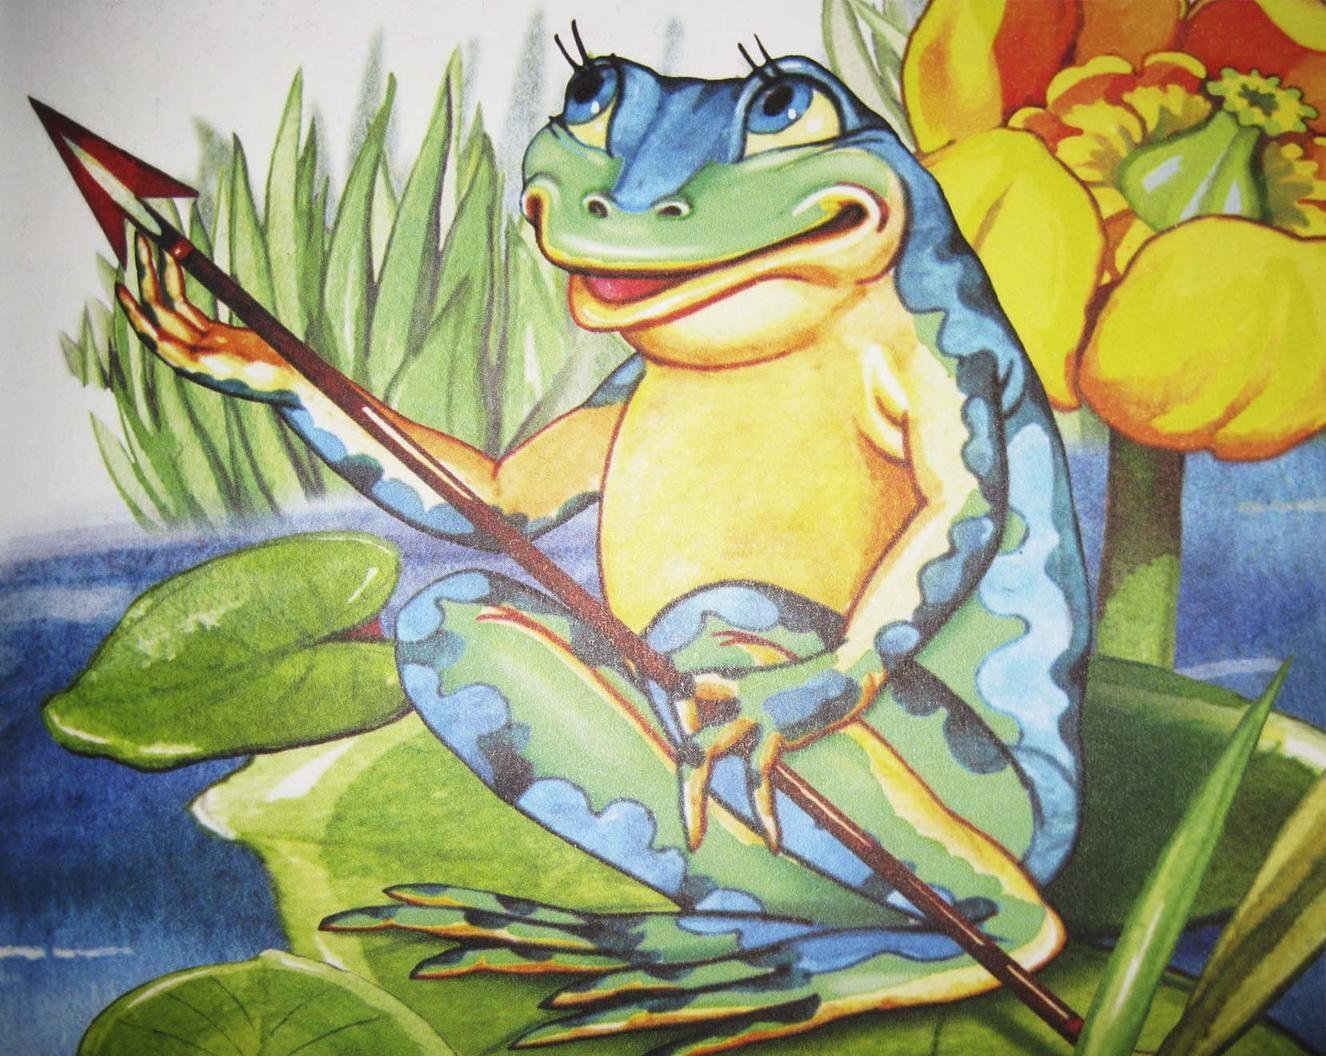 Поздравление картинка, лягушка царевна картинки к сказке